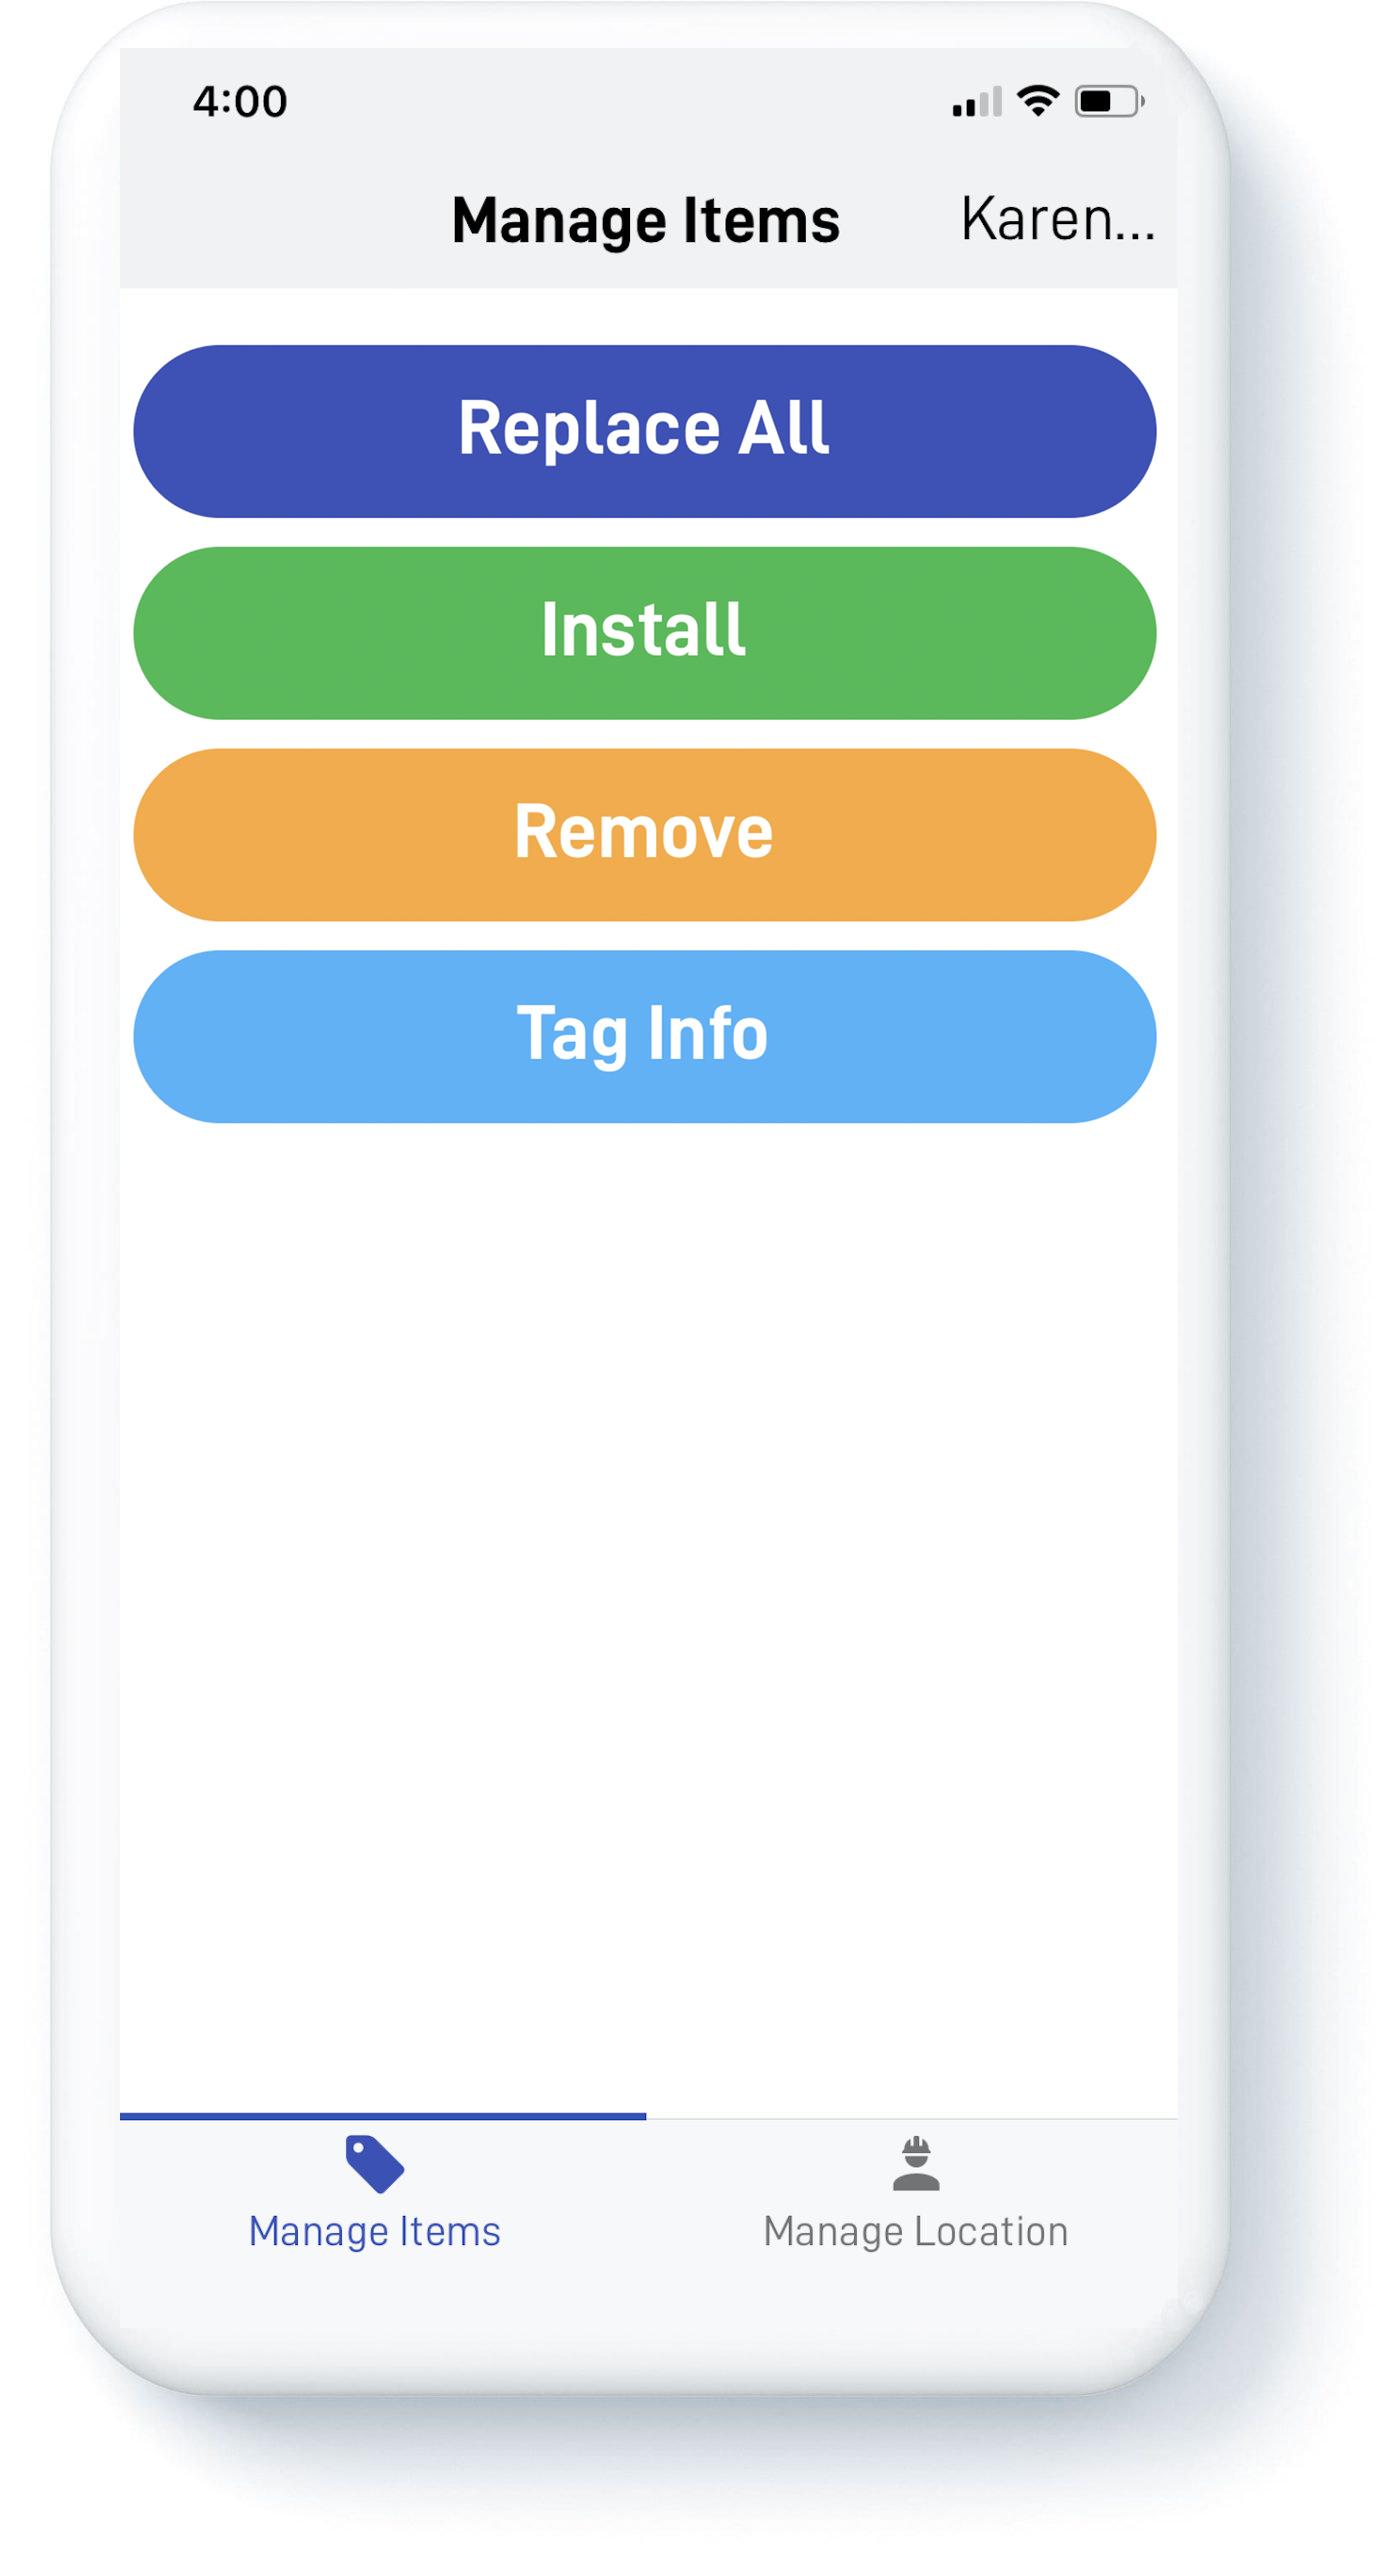 Phone screen showing KleenEdge iOS application